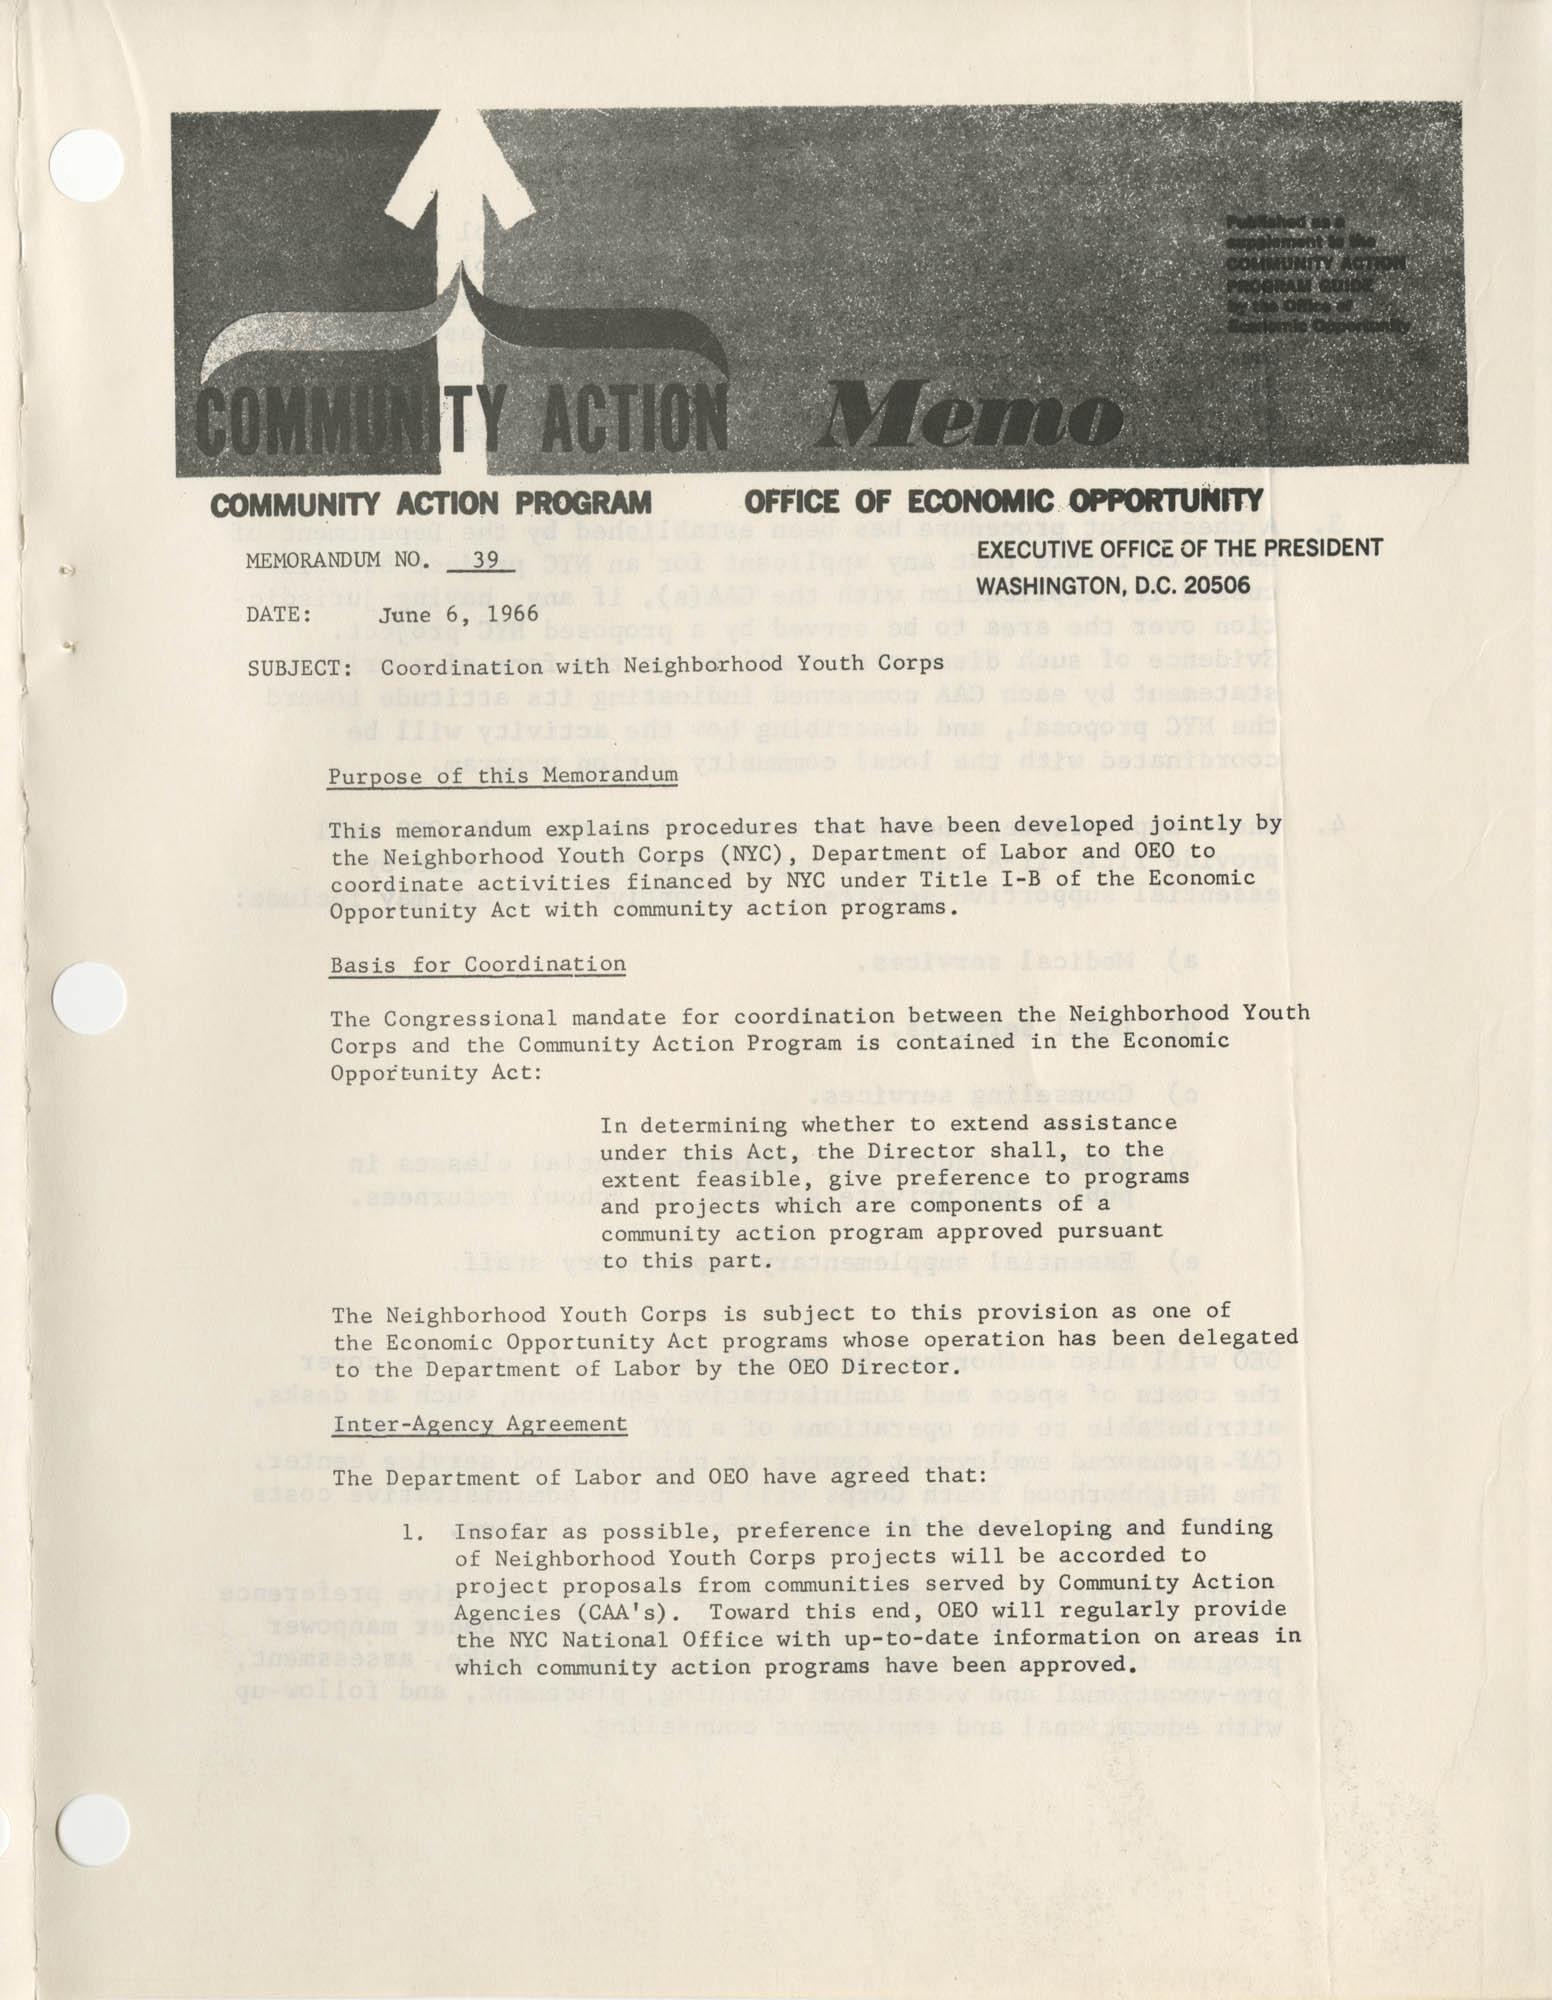 Community Action Program Memorandum No. 39, Memo Page 1